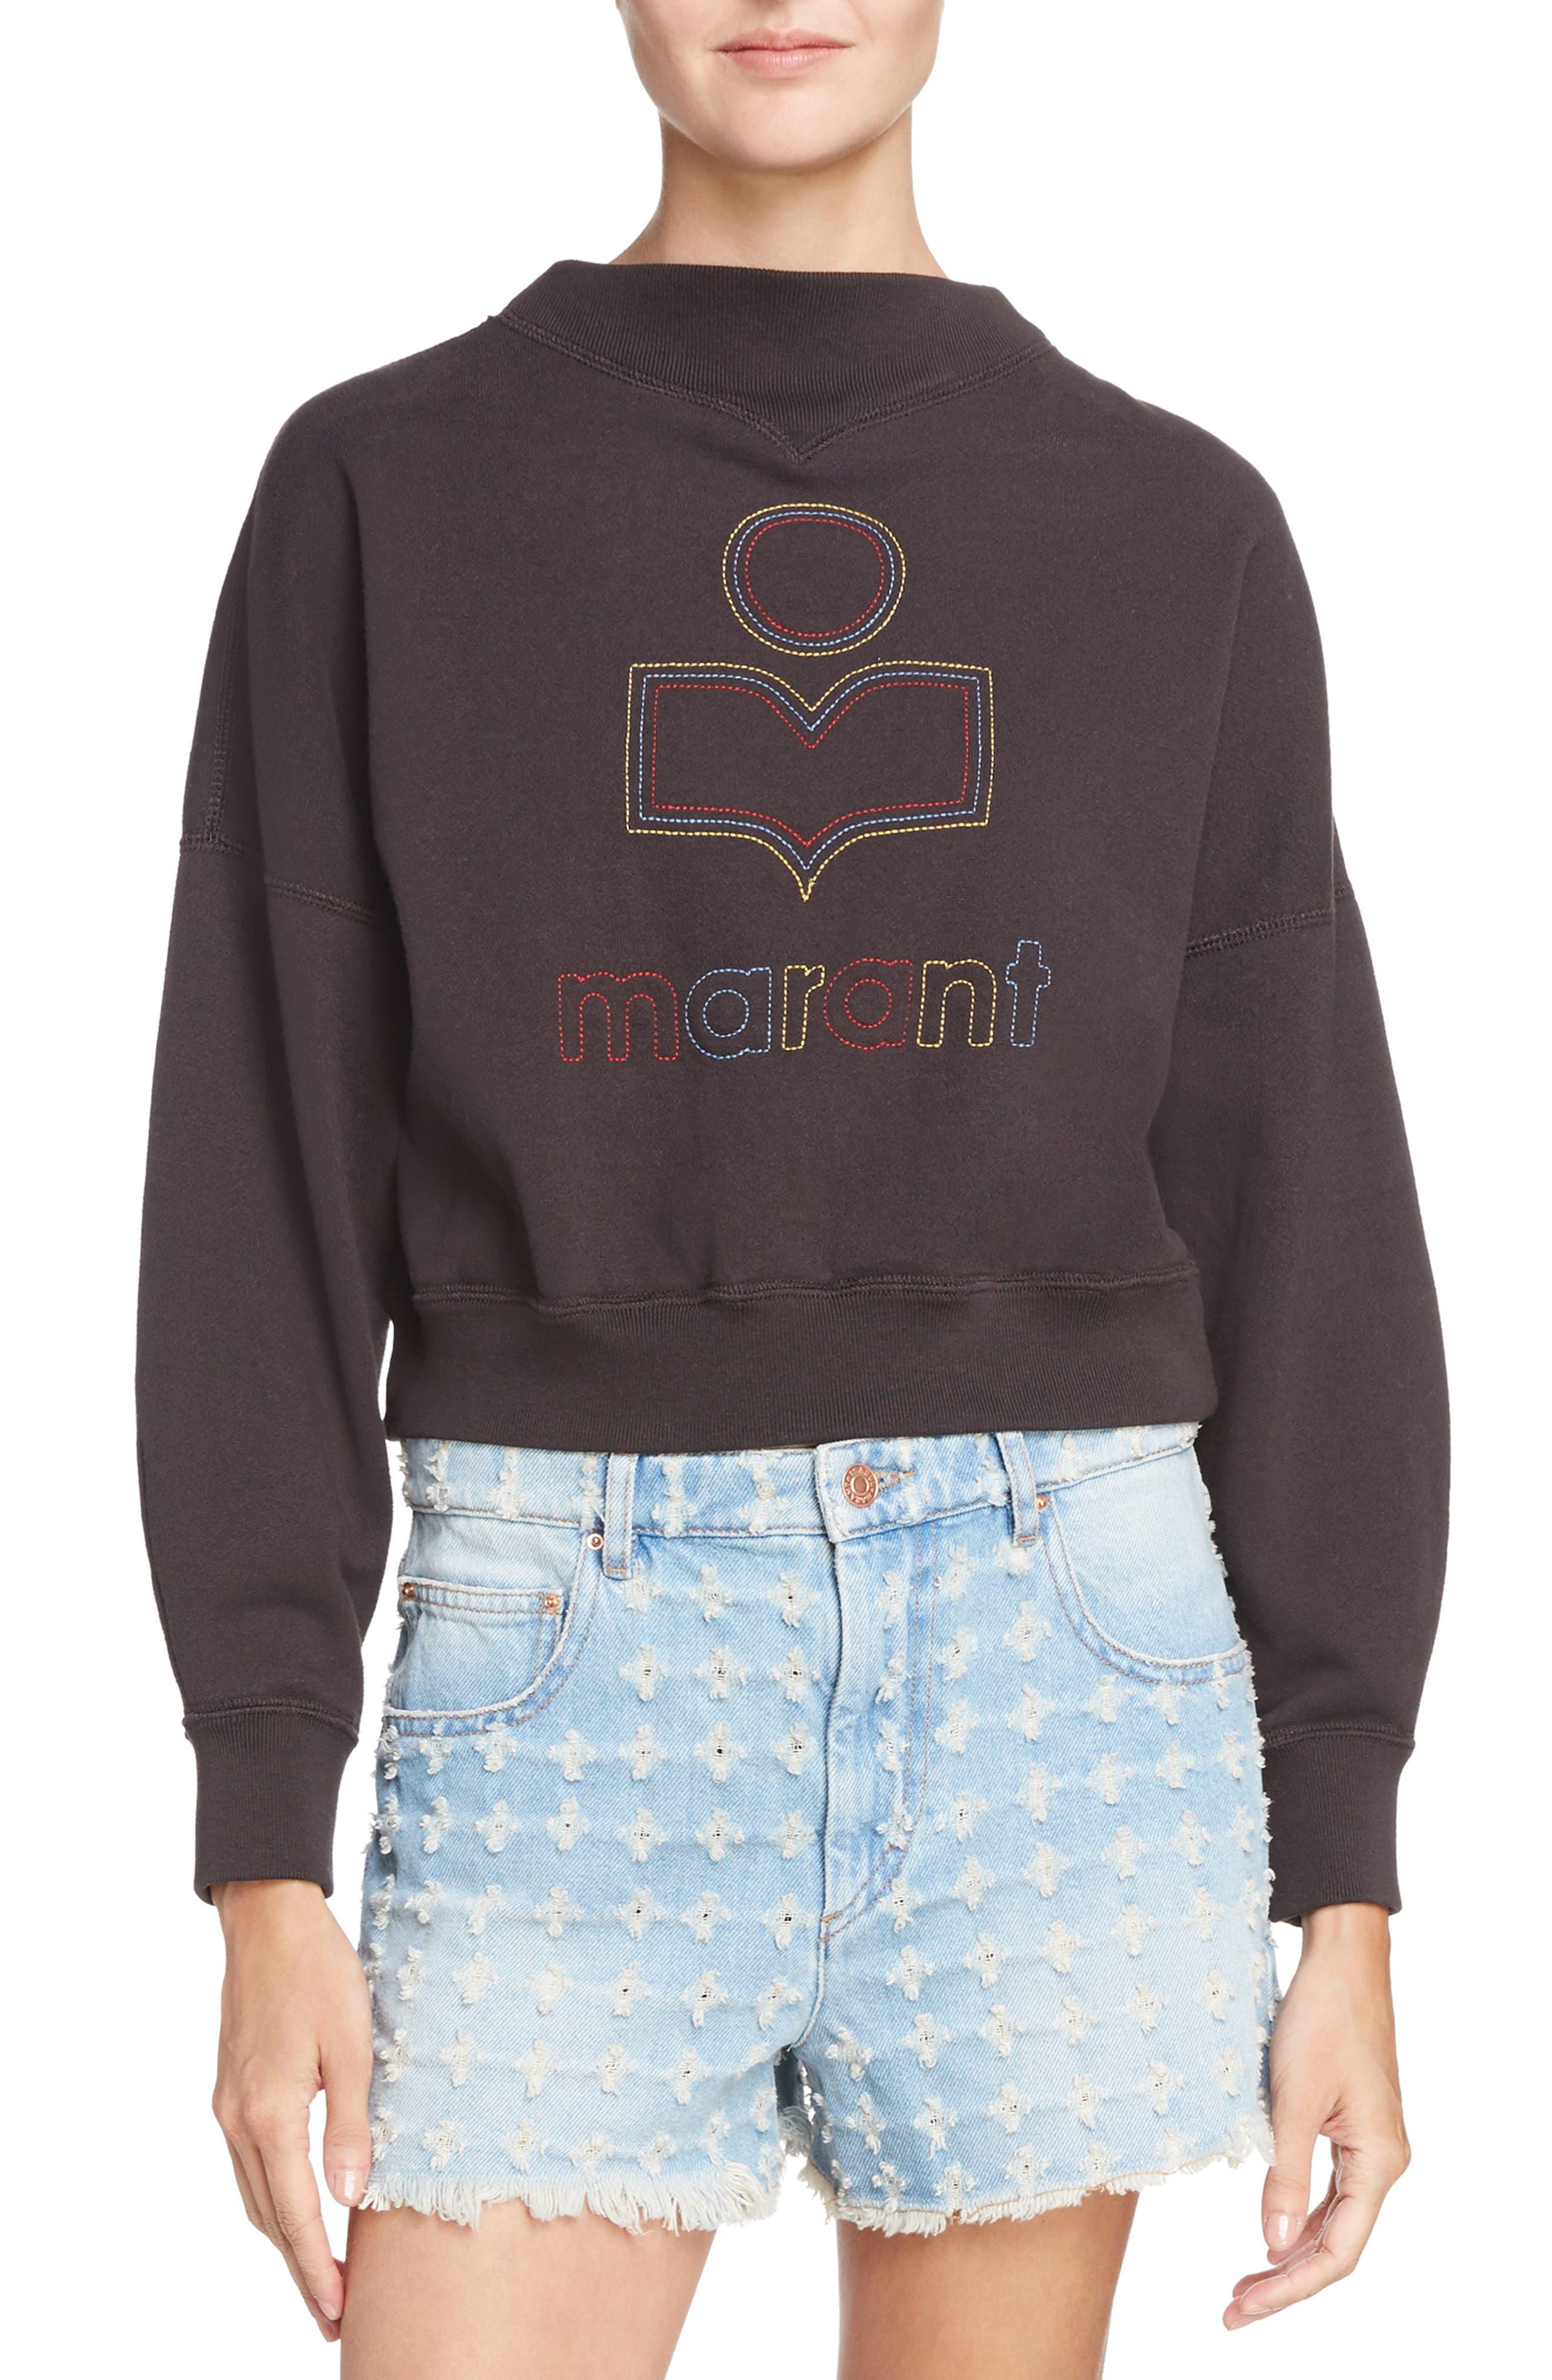 Isabel Marant Étoile Odilon Sweatshirt,                             Main thumbnail 1, color,                             Faded Black